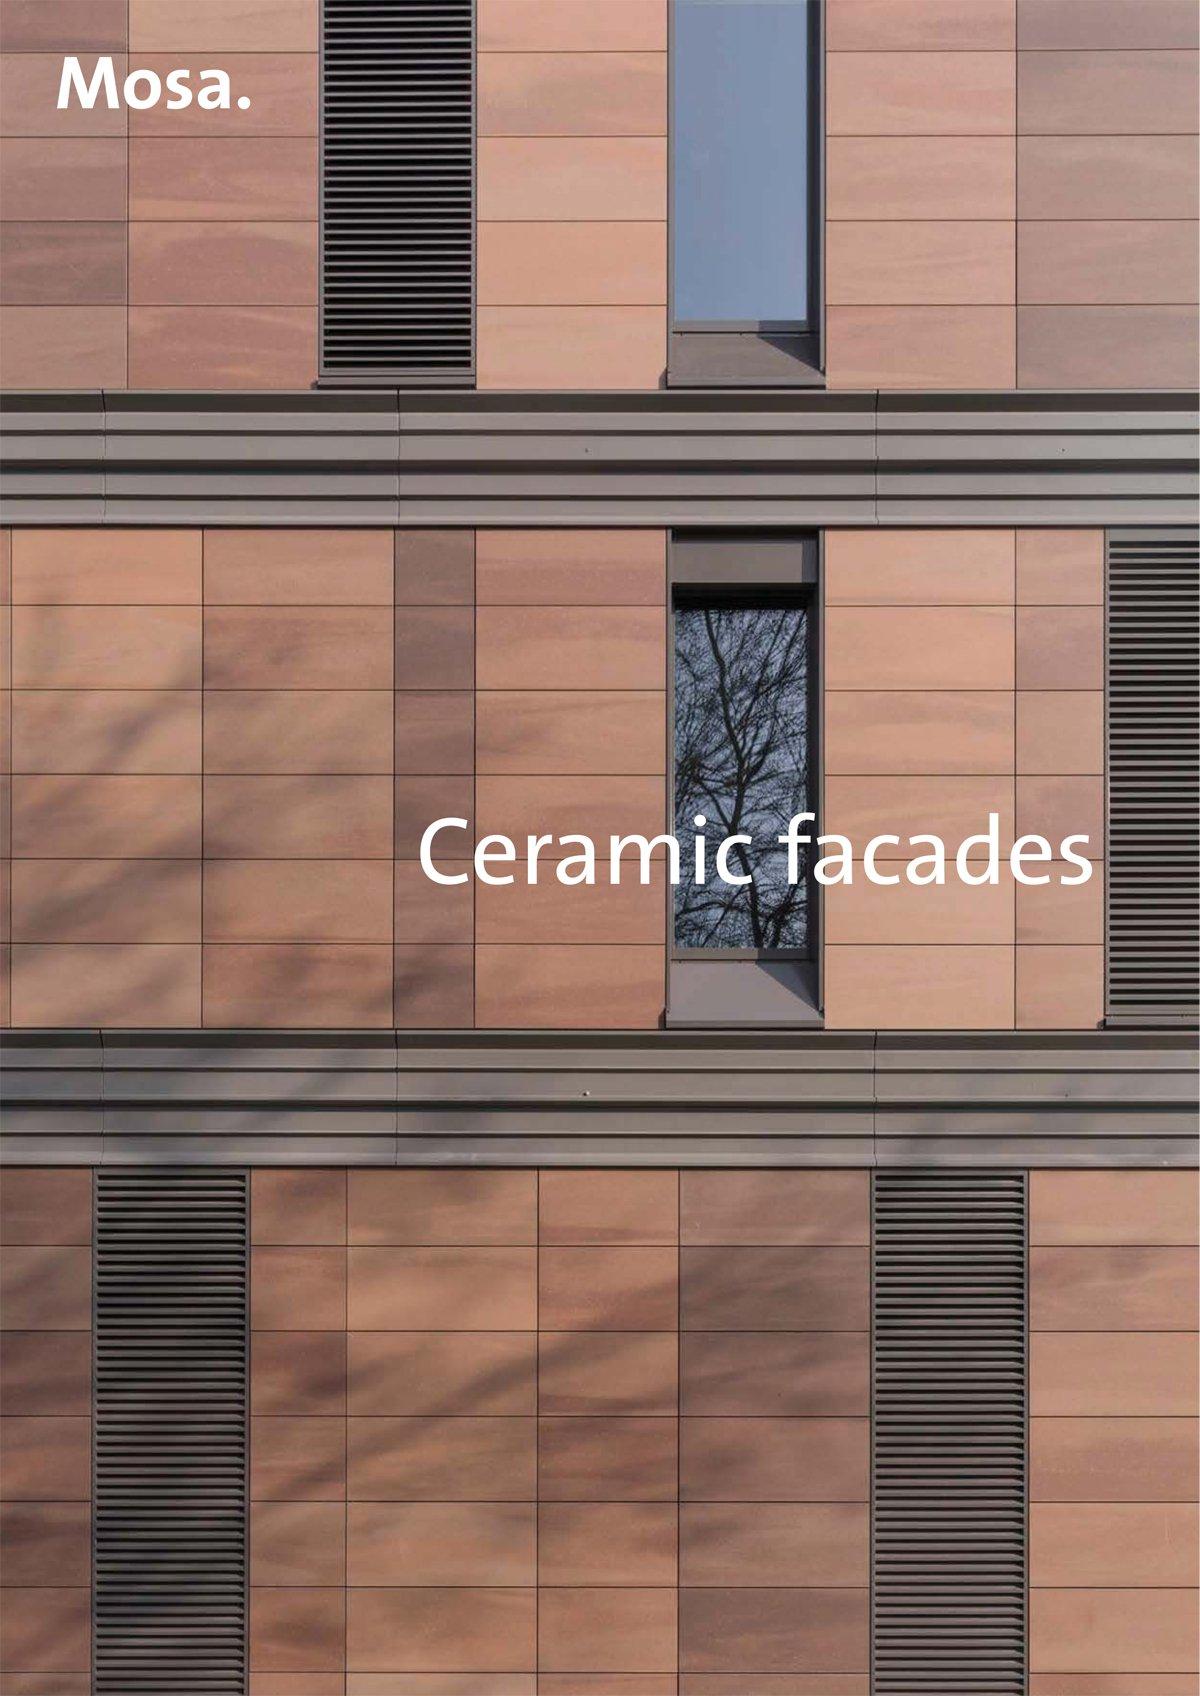 Mosa-Ceramic-facades-brochure-cover